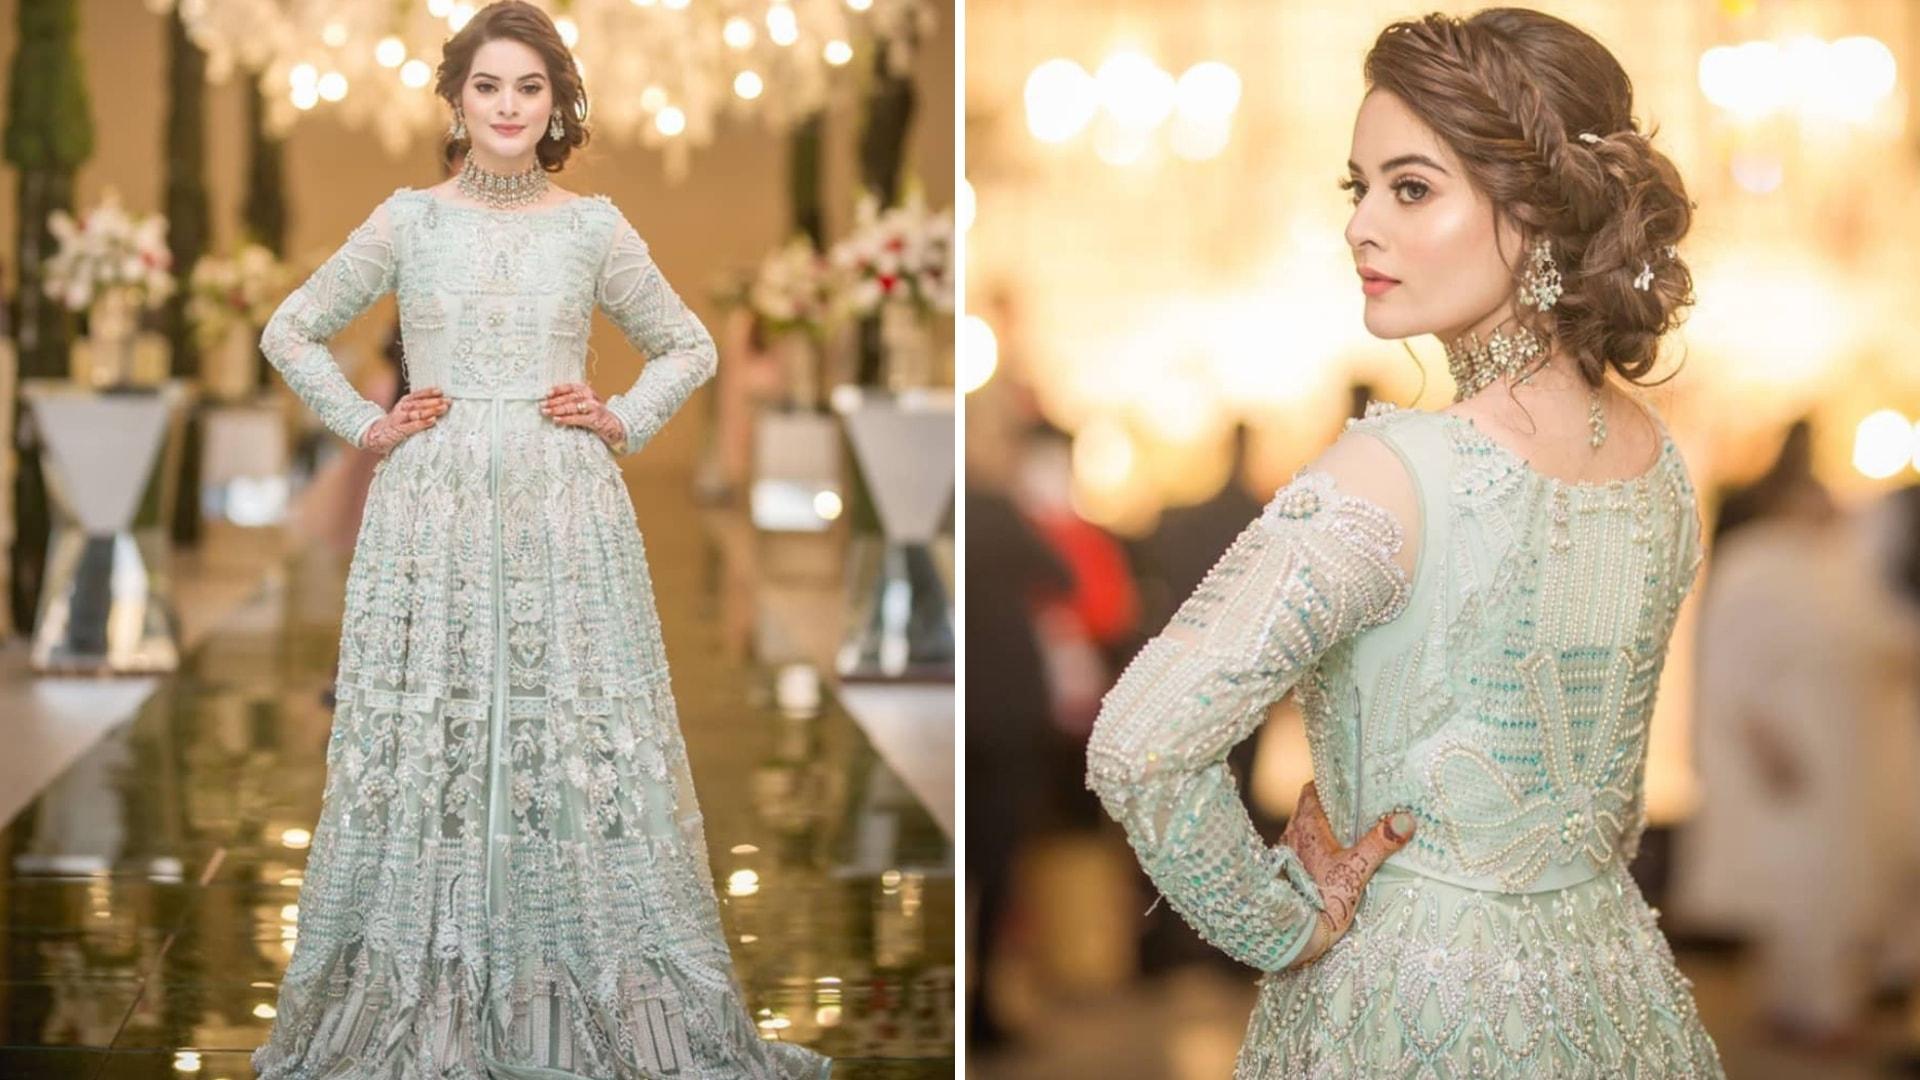 Minal dress at Aineeb wedding